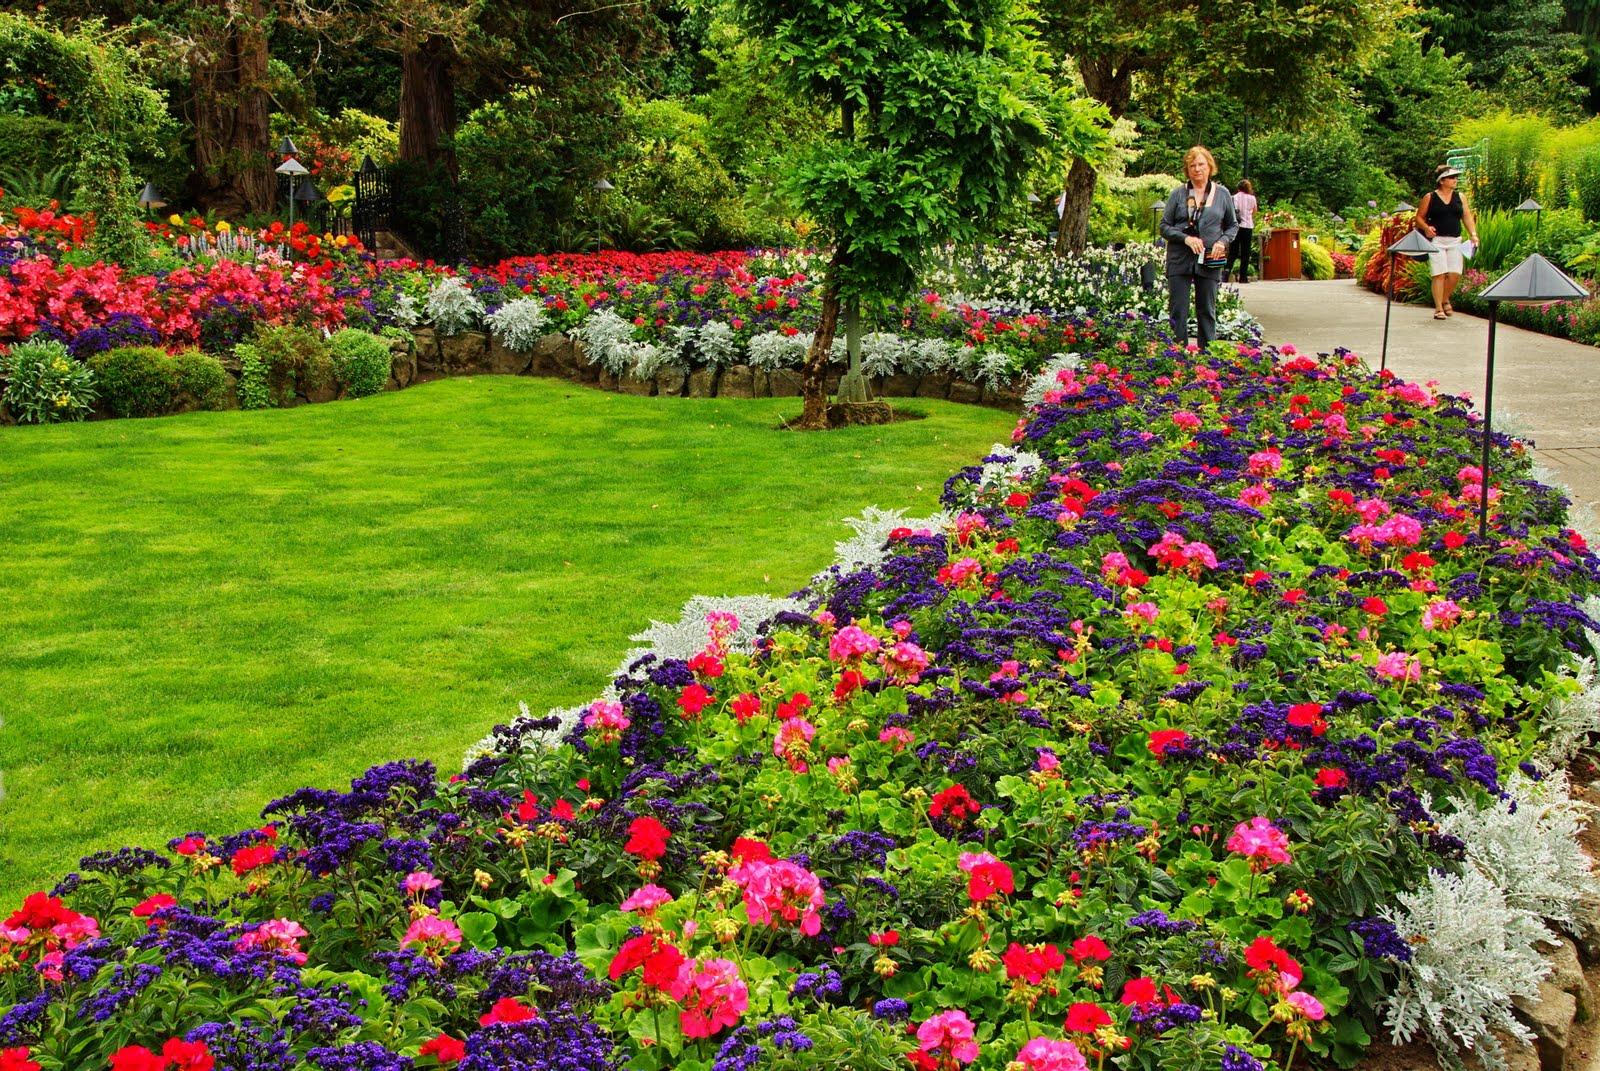 http://2.bp.blogspot.com/_LFsy49yCUjg/TDIPi7Ua-4I/AAAAAAAAAVM/ZMYctYpK8jY/s1600/S_Curve_Gardens.jpg